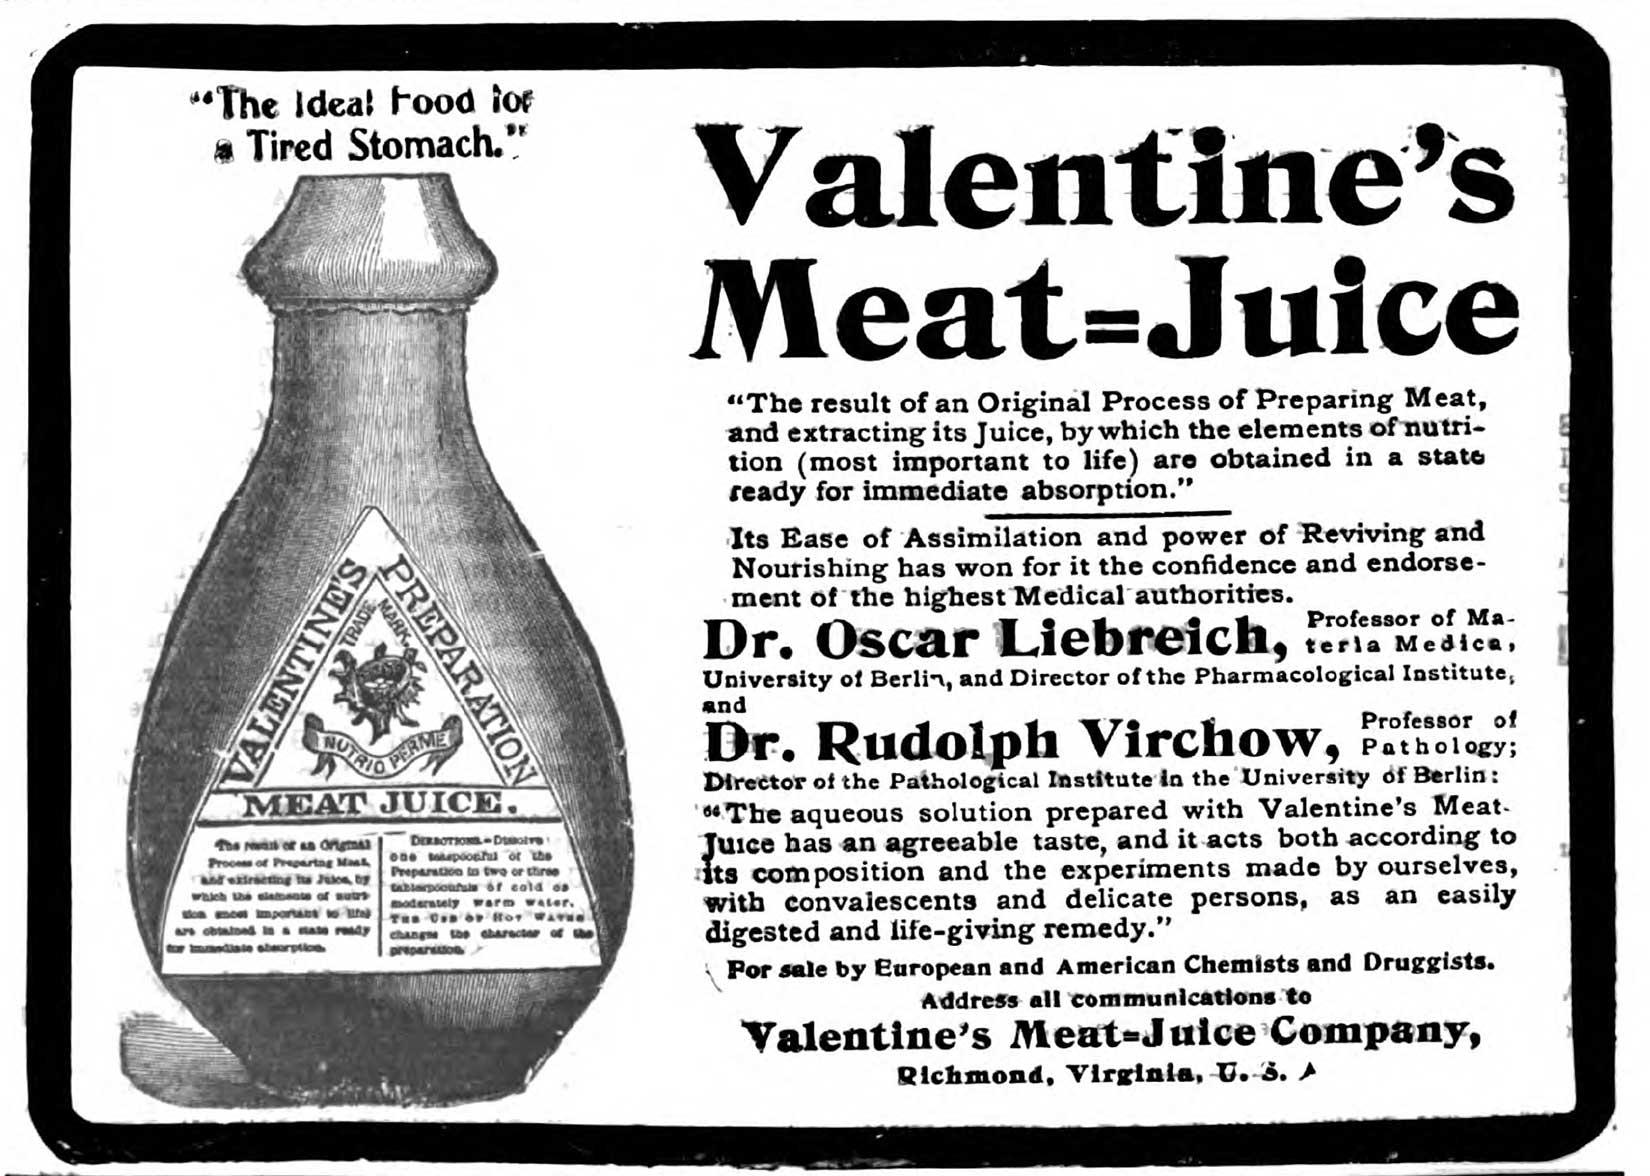 Valentine-Meat-Juice-Lancet